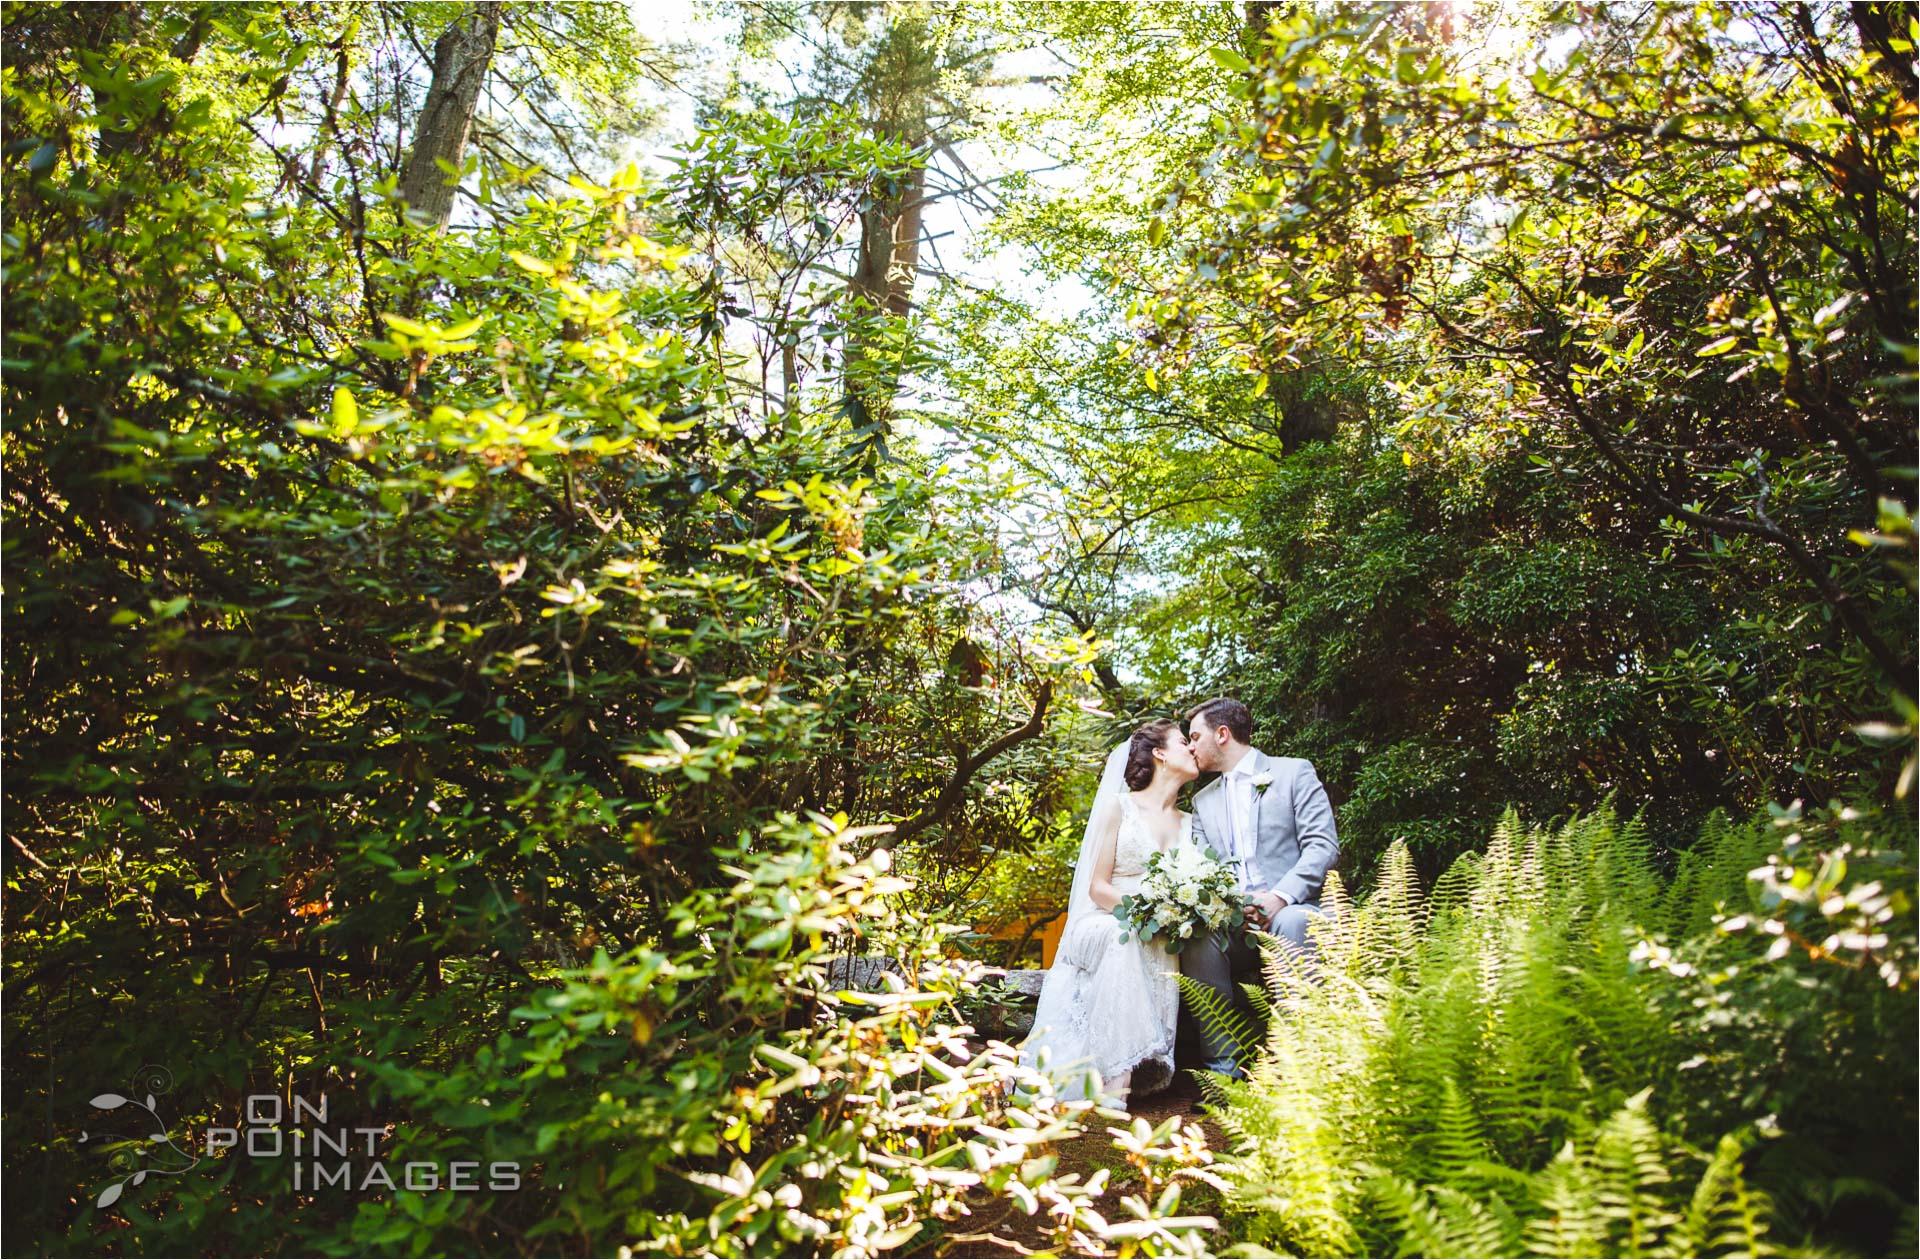 wickham-park-wedding-photographer-ct-01.jpg